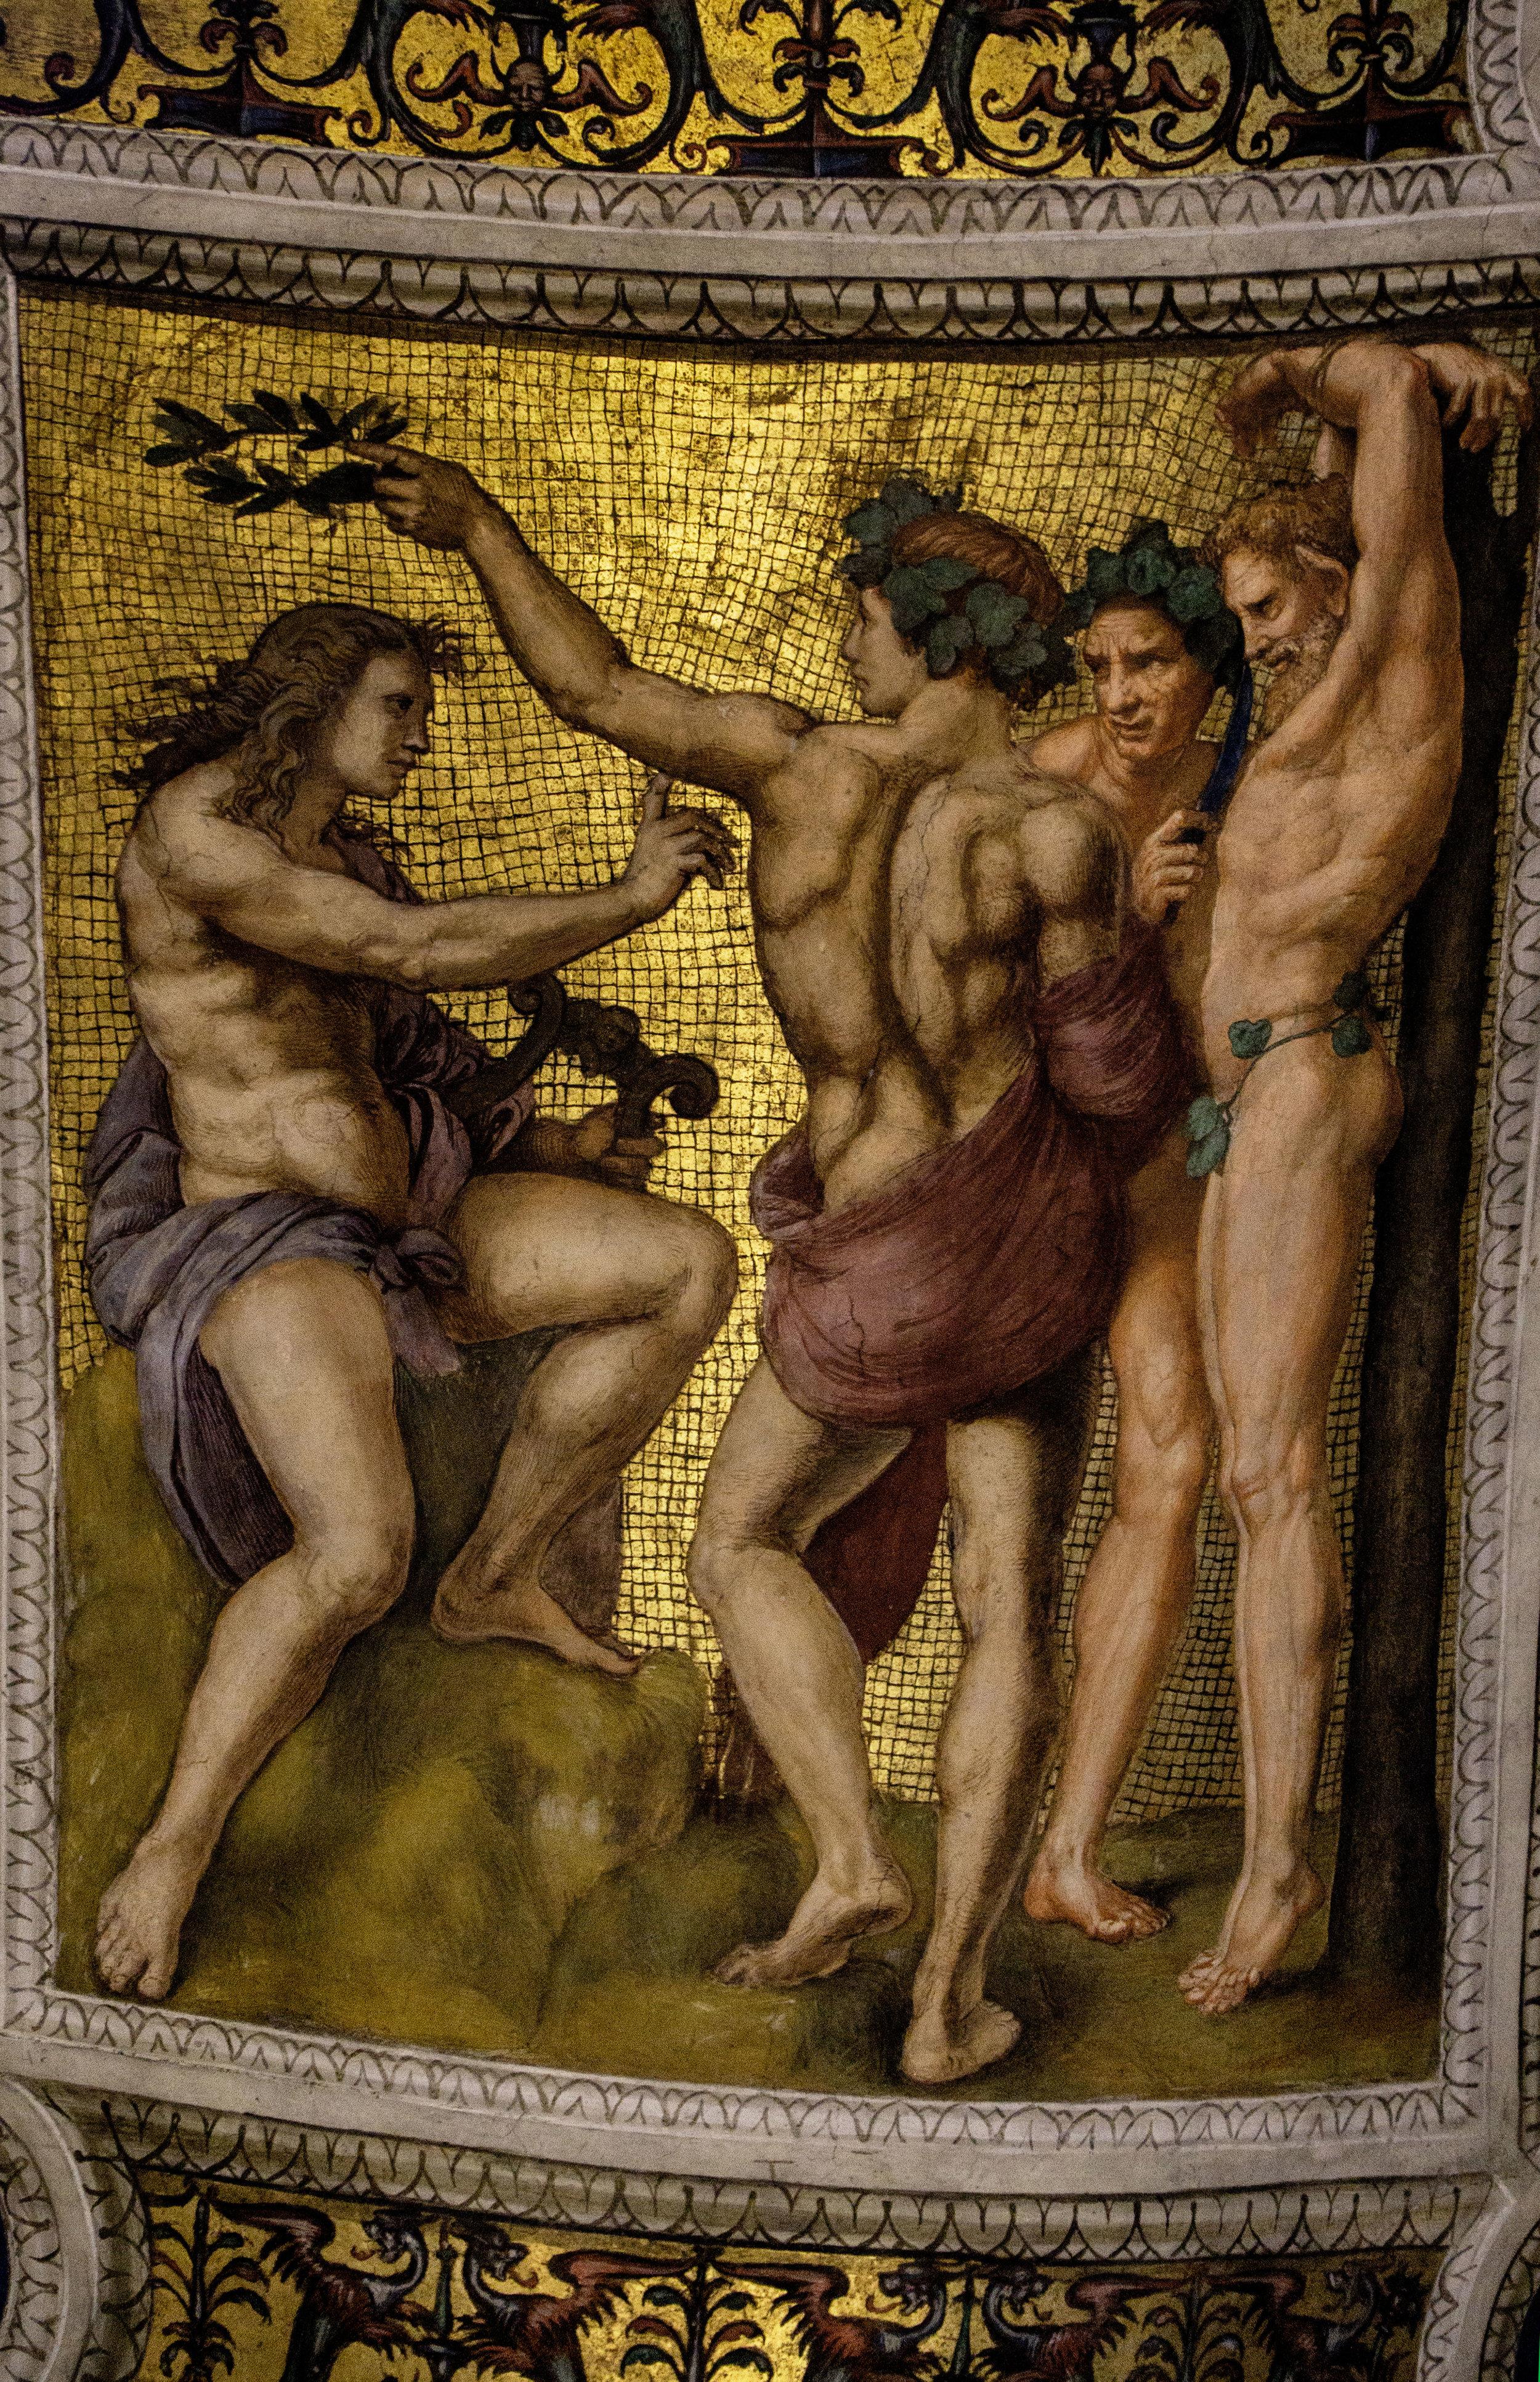 rome_vatican_museum_vickygood_travel_photographysm.jpg